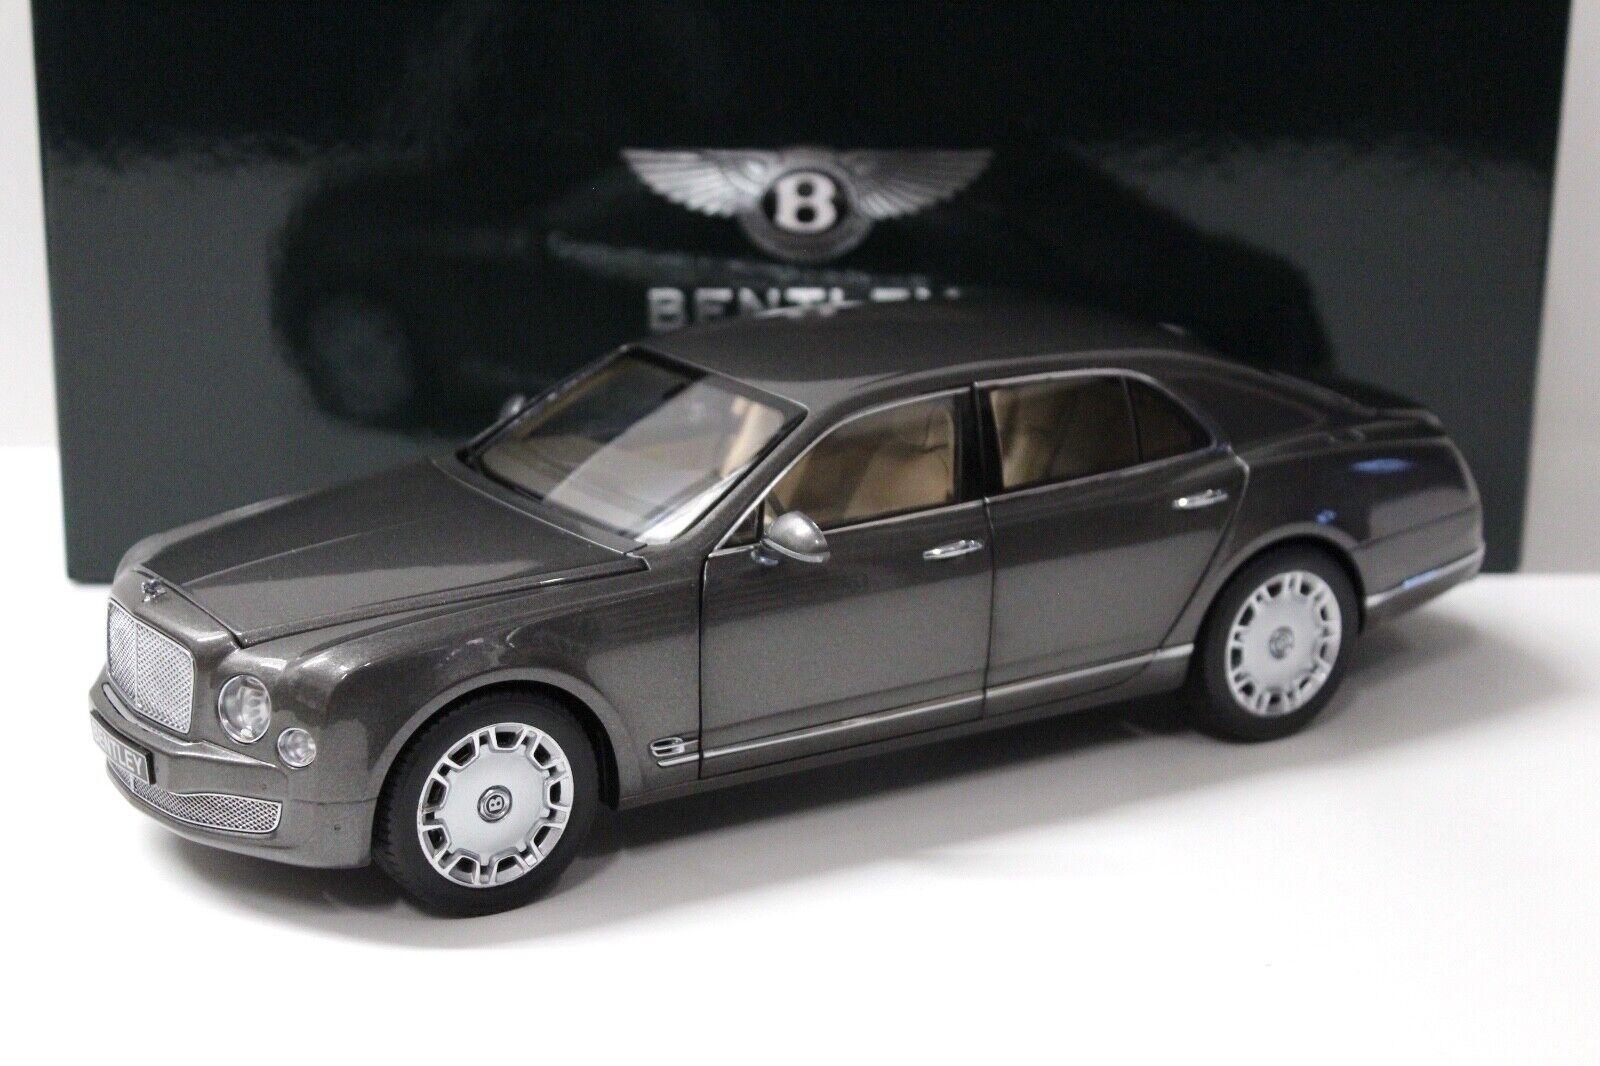 1 18 Minichamps Bentley Mulsanne Brodgar gris Dealer New chez Premium-modelcars